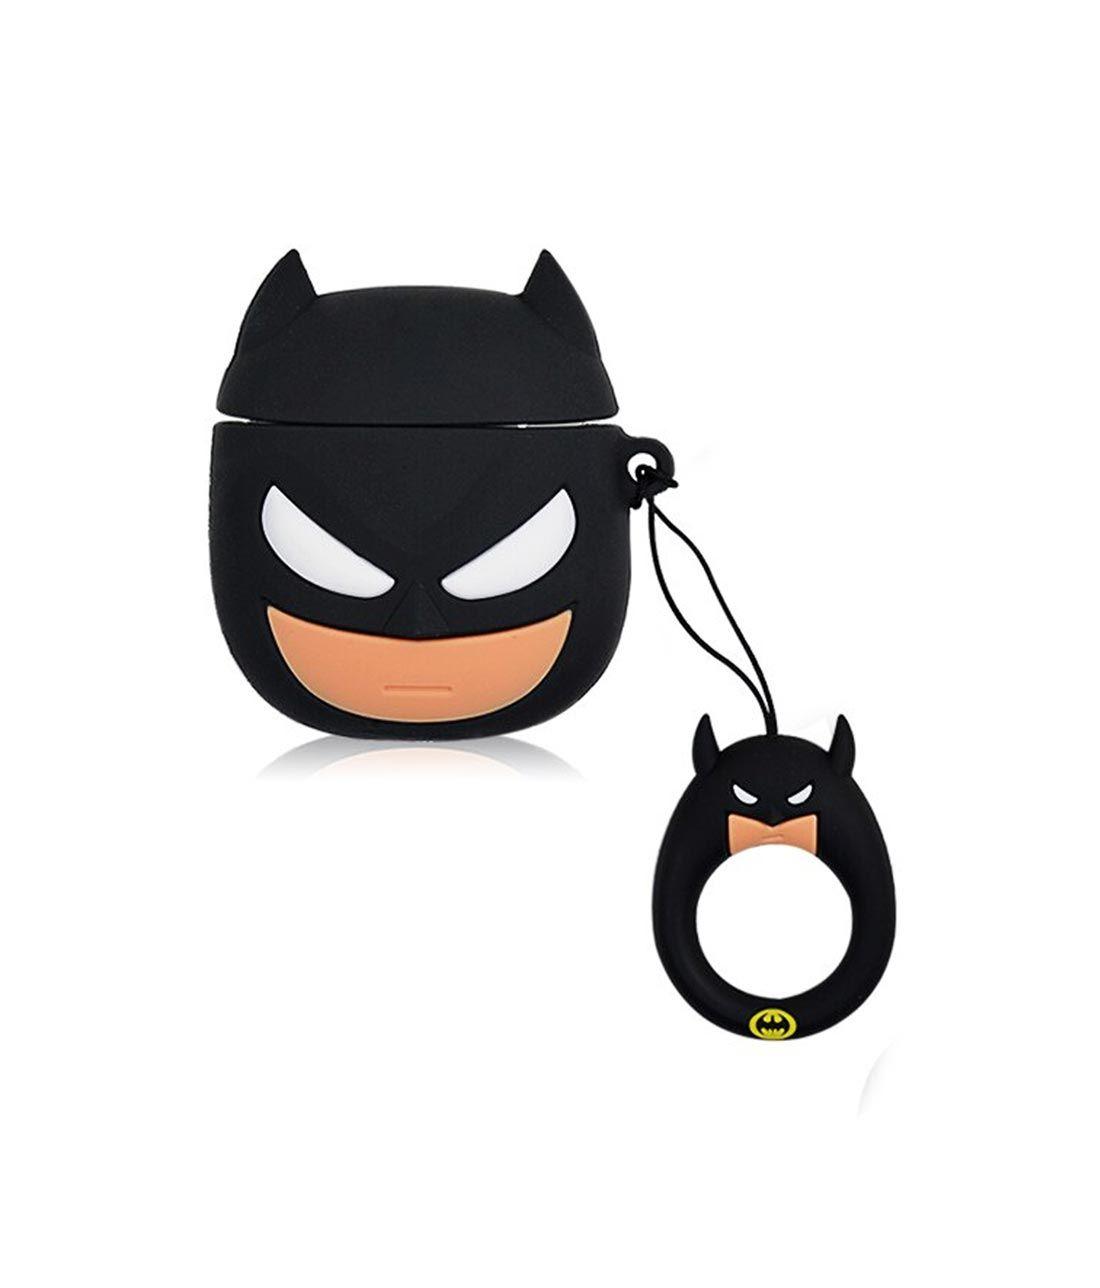 Batman Returns - AirPods Case